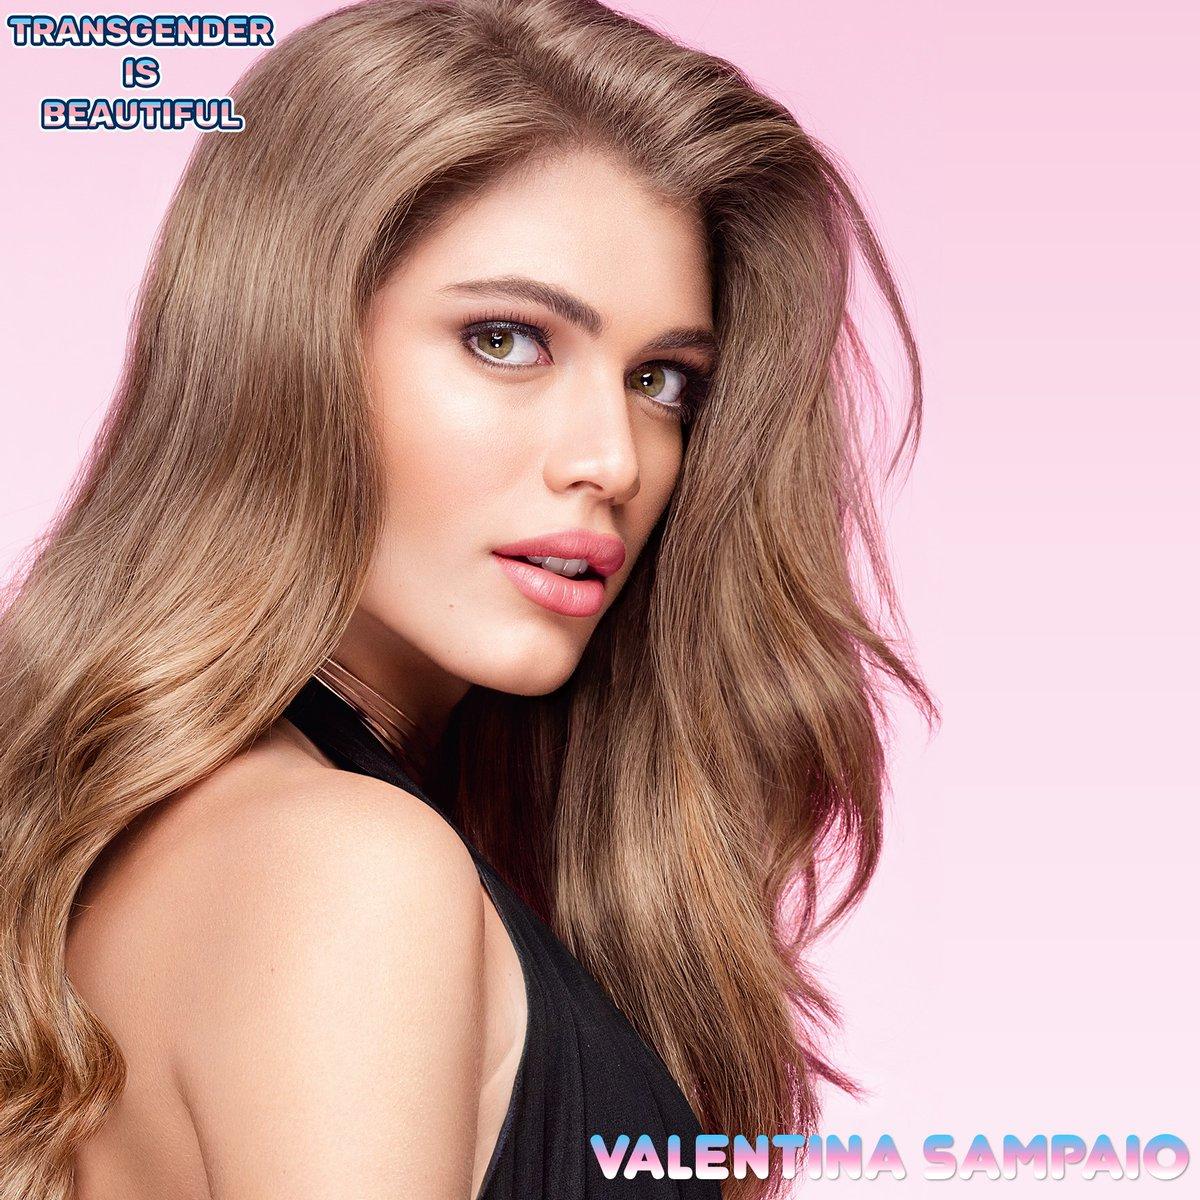 #TransIsBeautiful 🦋 A Hot 🔥 #TransgenderModel ⚧ — Valentina Sampaio #transmingle #transwoman #tgwoman #trans #lgbt #lgbtq #femme #girlslikeus #tgirl #tsgirl #transproud #valentinasampaio